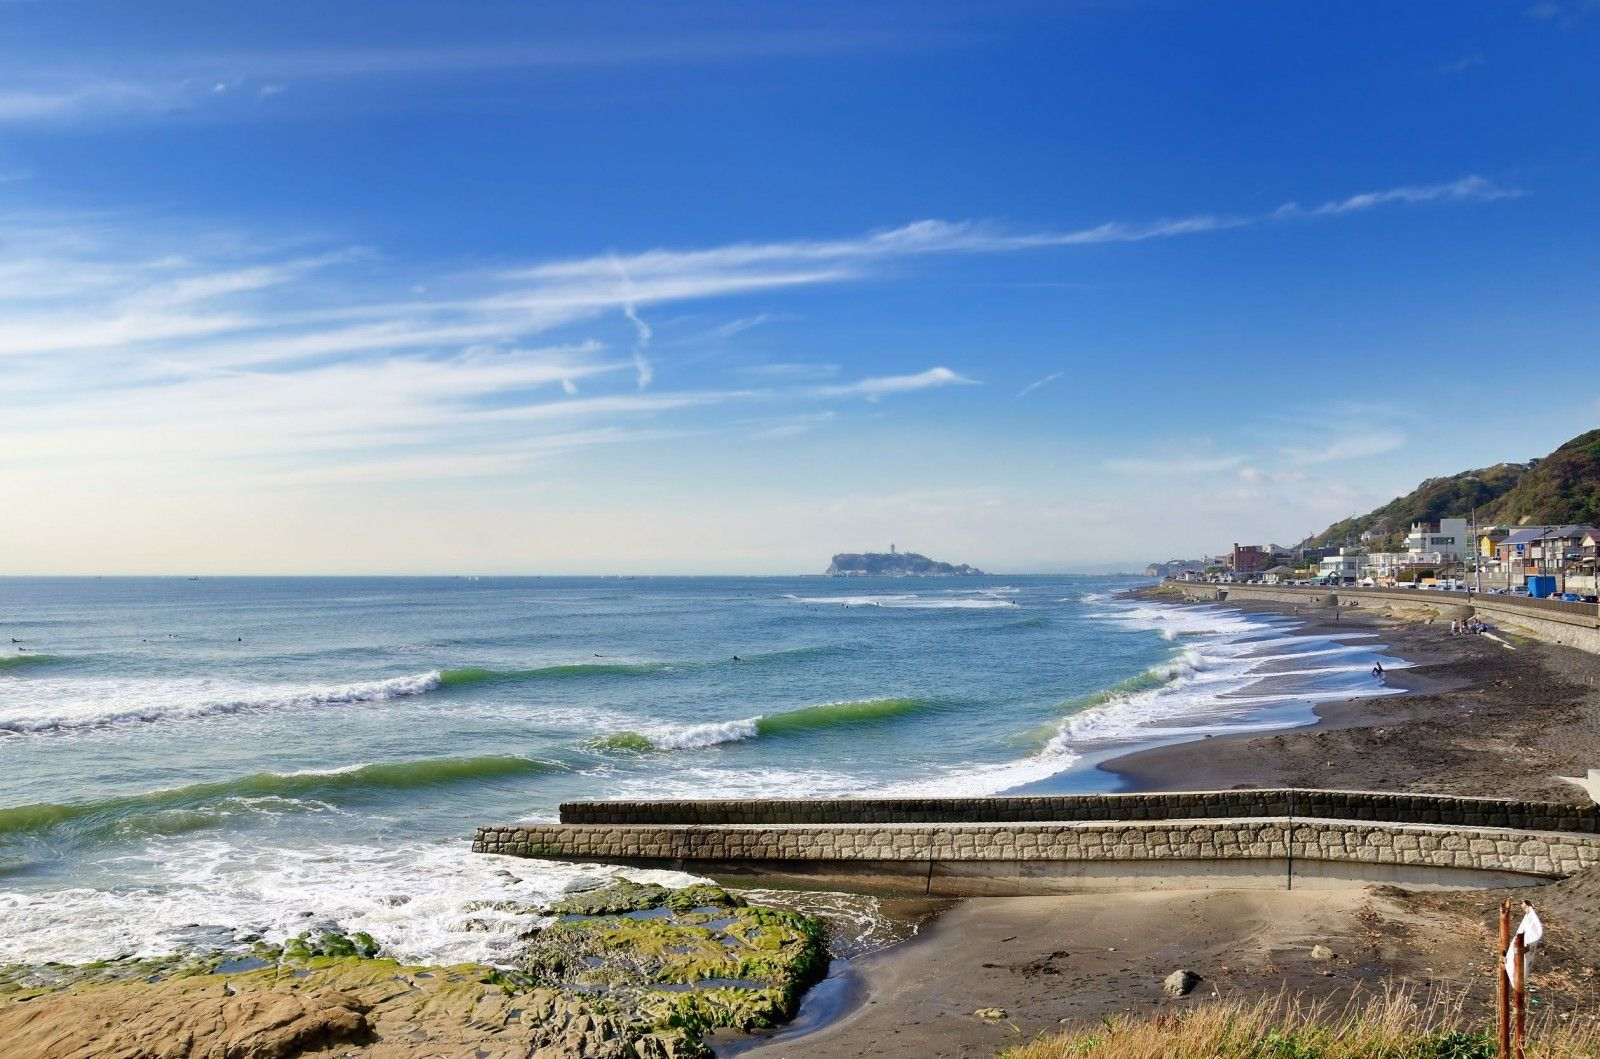 Kamakura Beach where Etsuko meets Donshi.